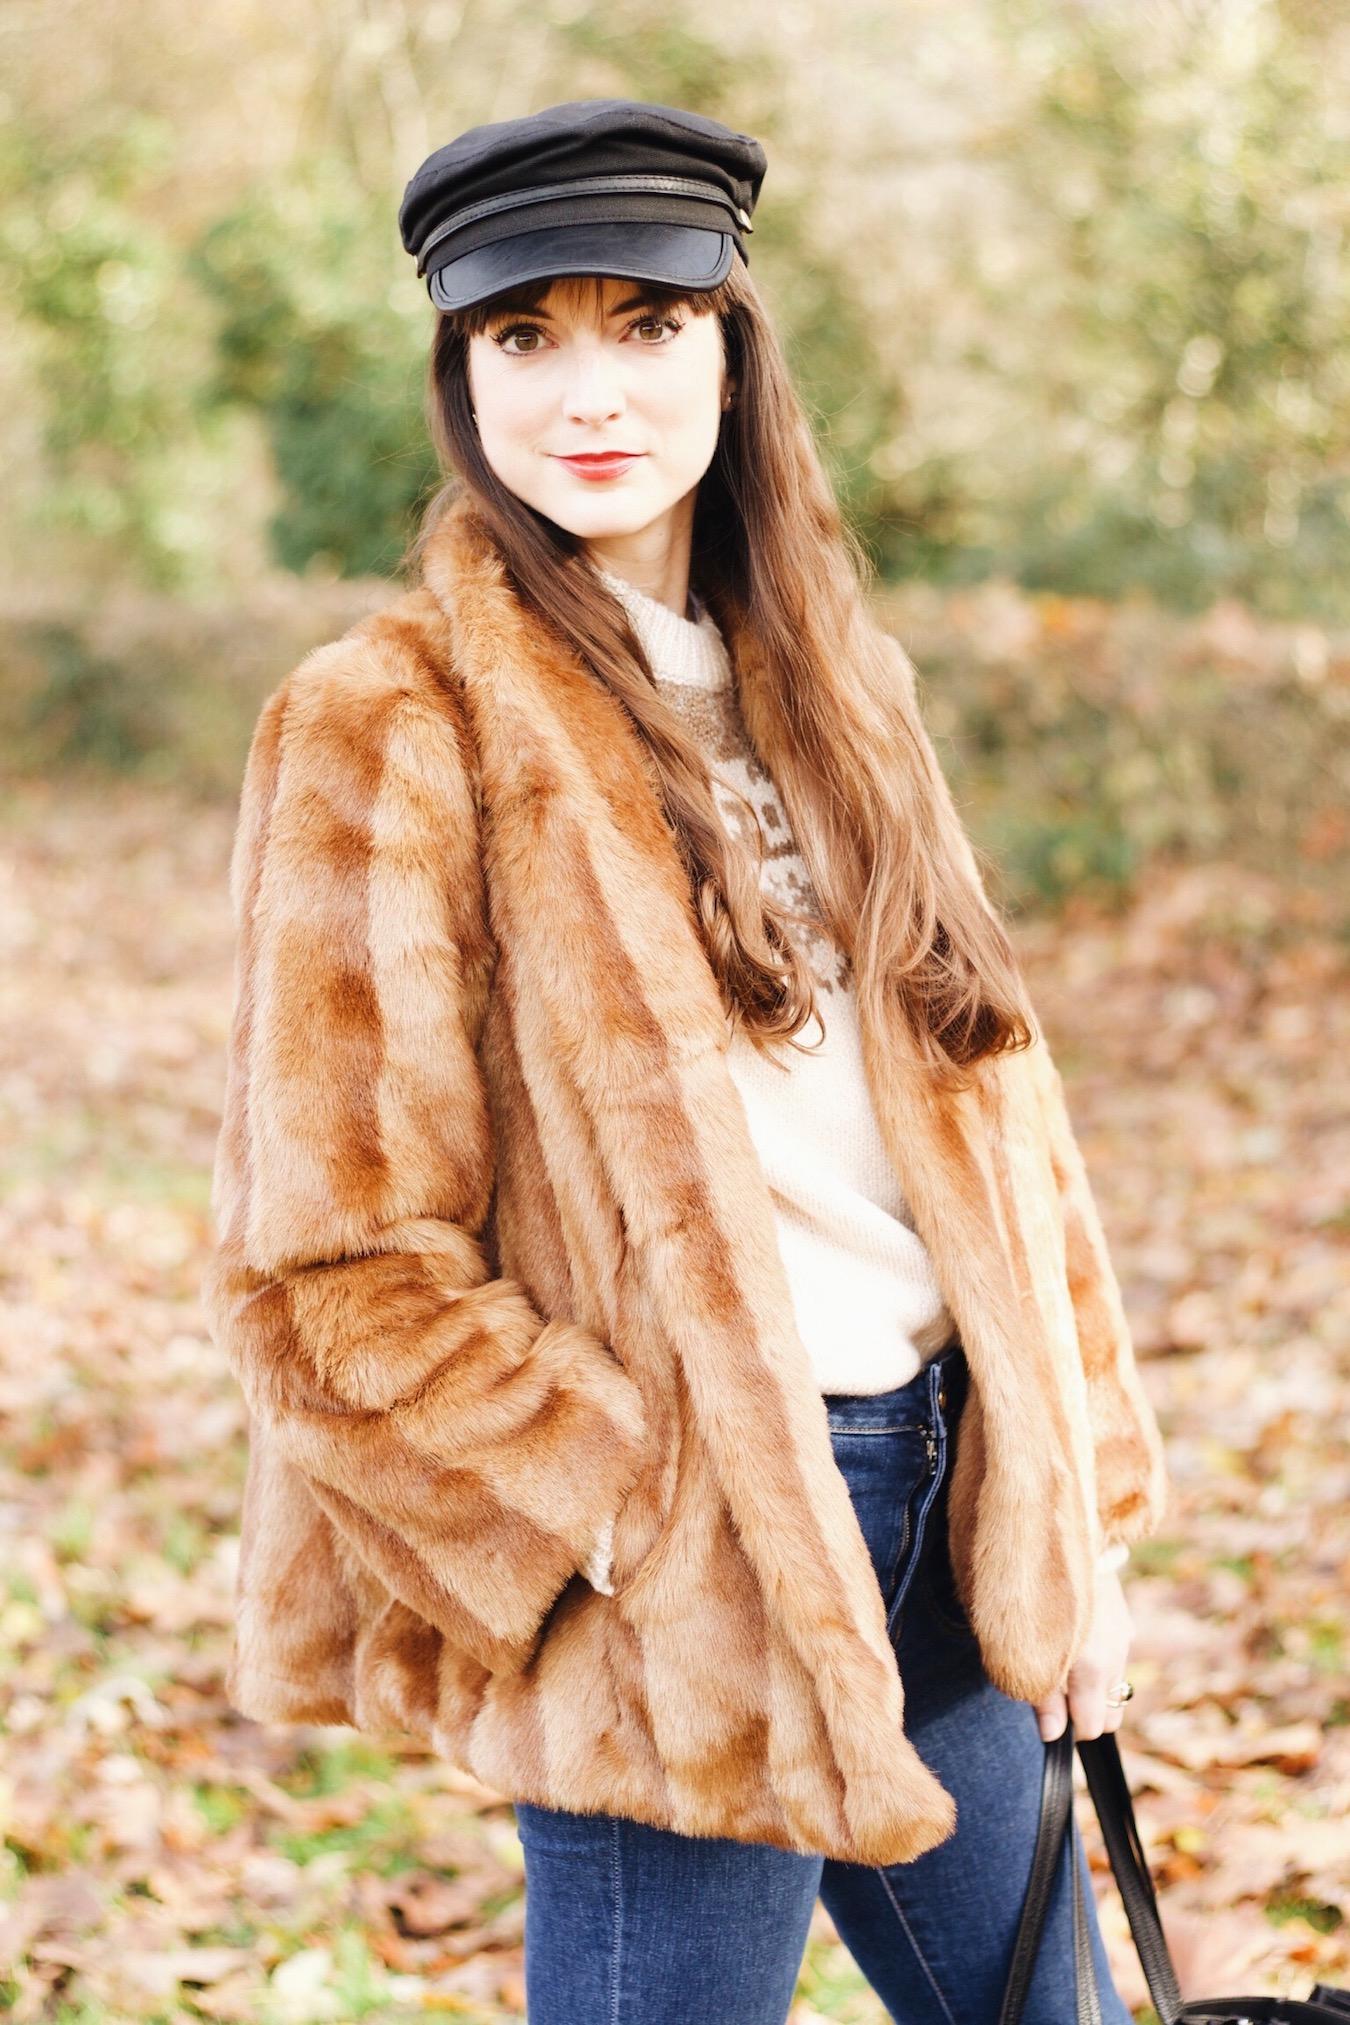 Modeblog Outfitpost mit Felljacke und Kick Flare Jeans